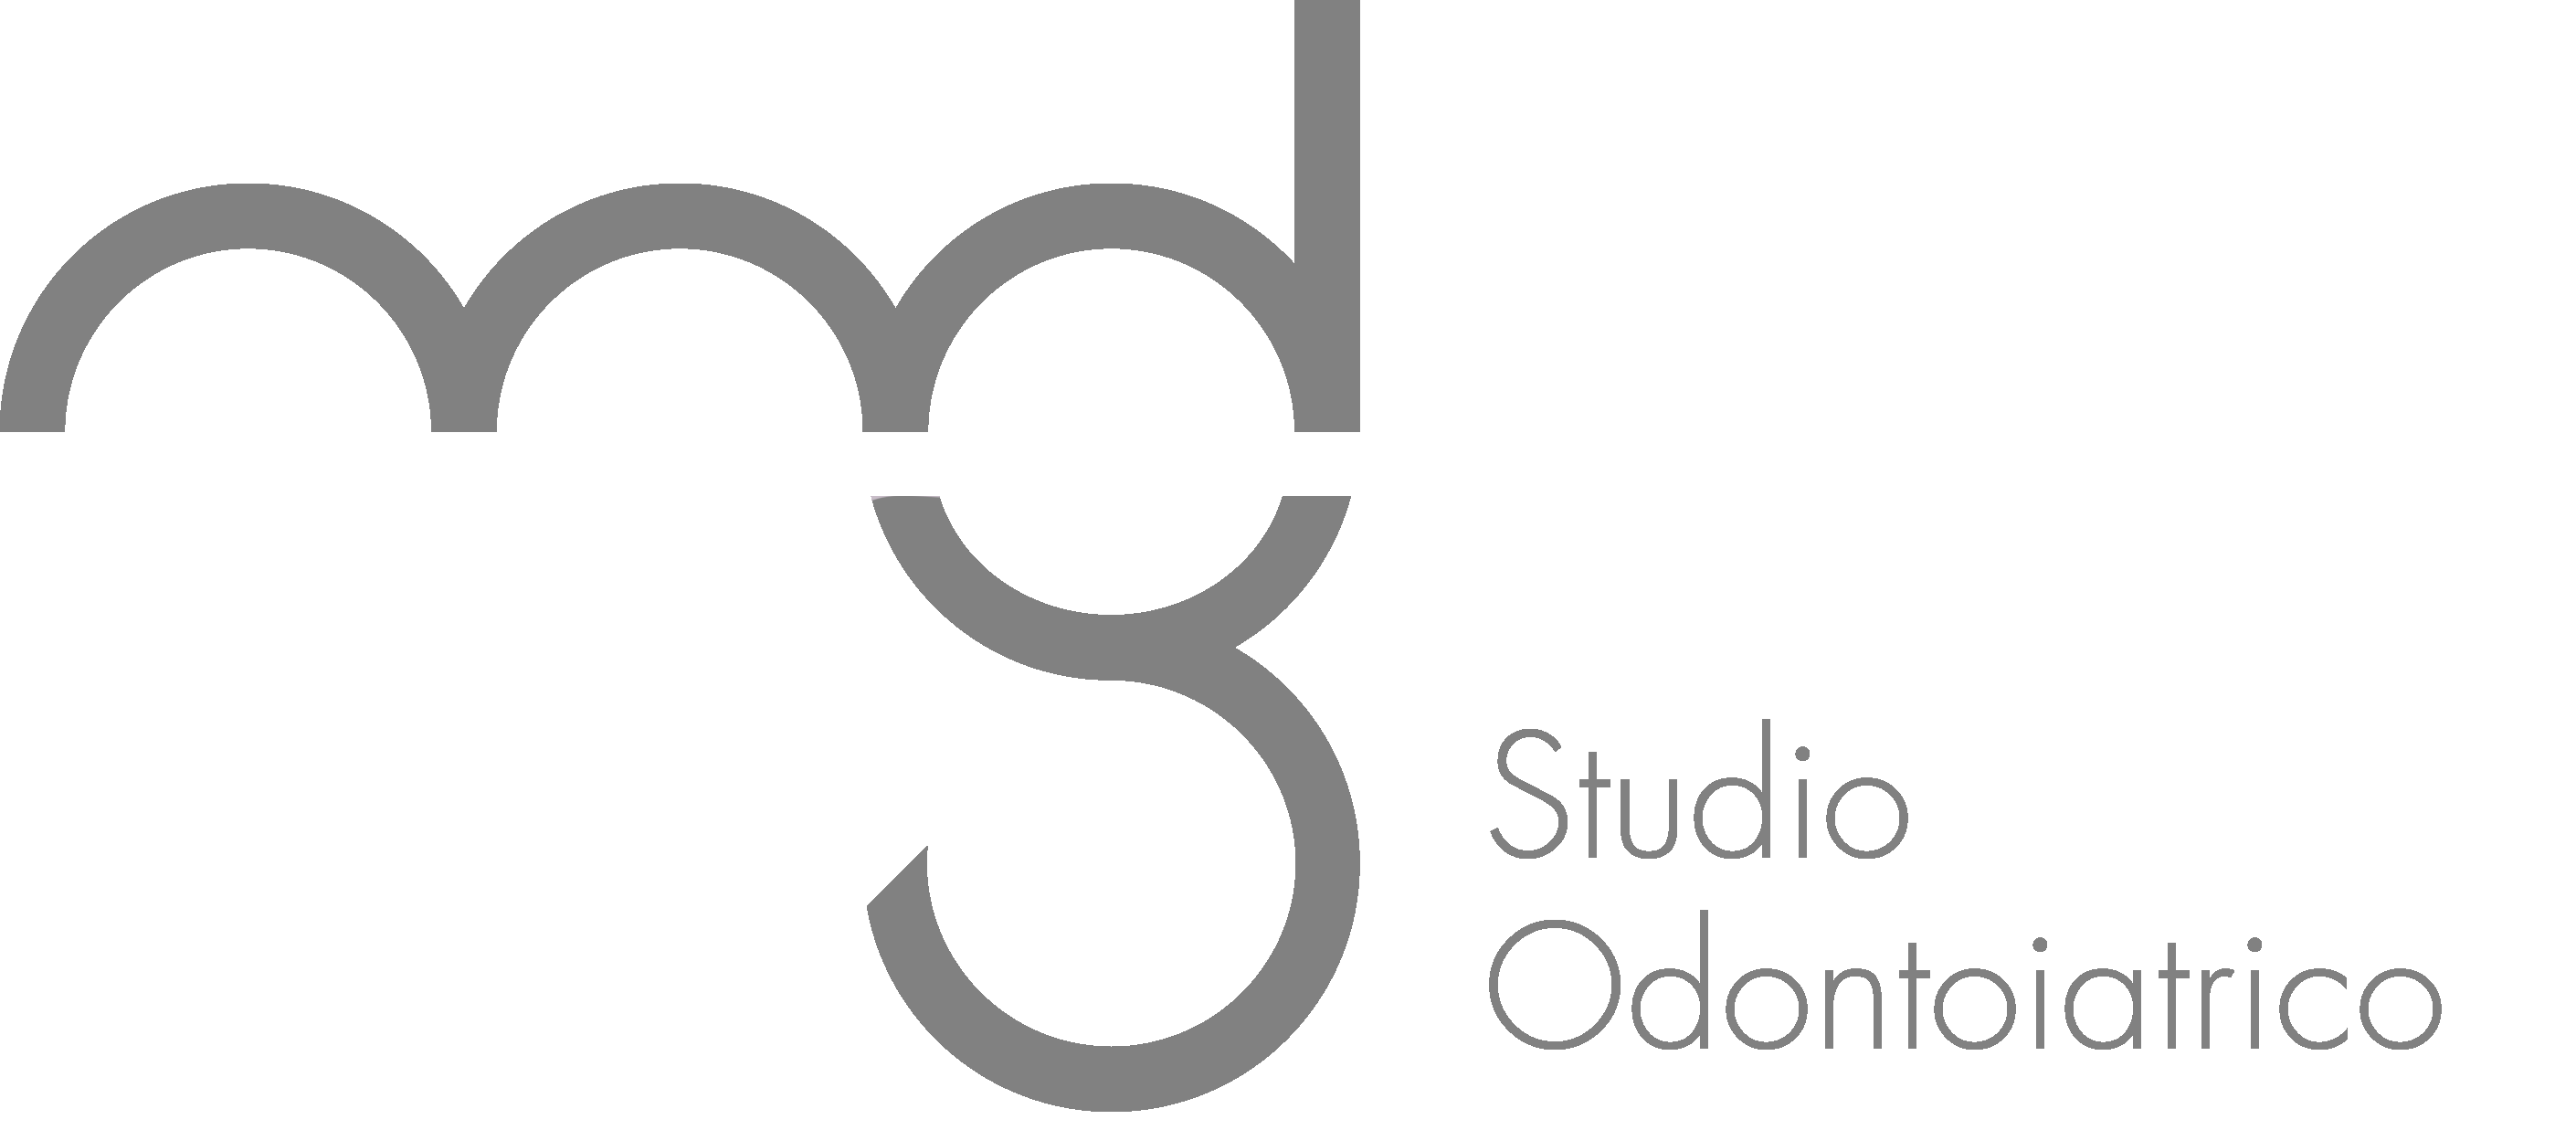 Studio Odontoiatrico Mattia di Girolamo